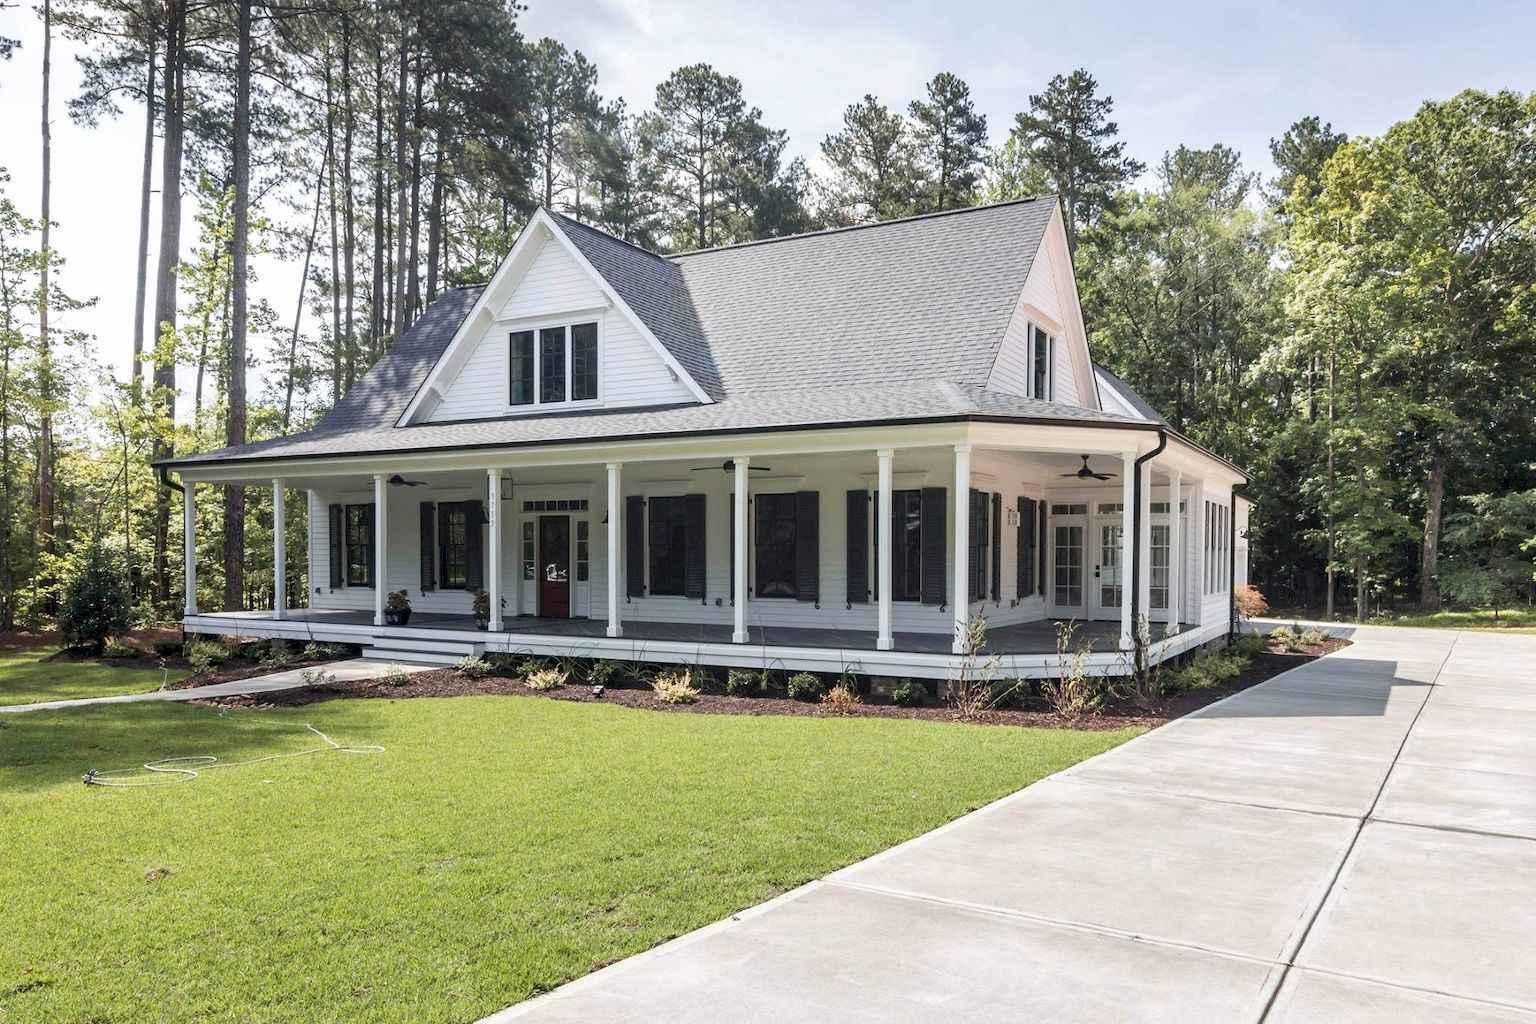 60 amazing farmhouse plans cracker style design ideas (12)